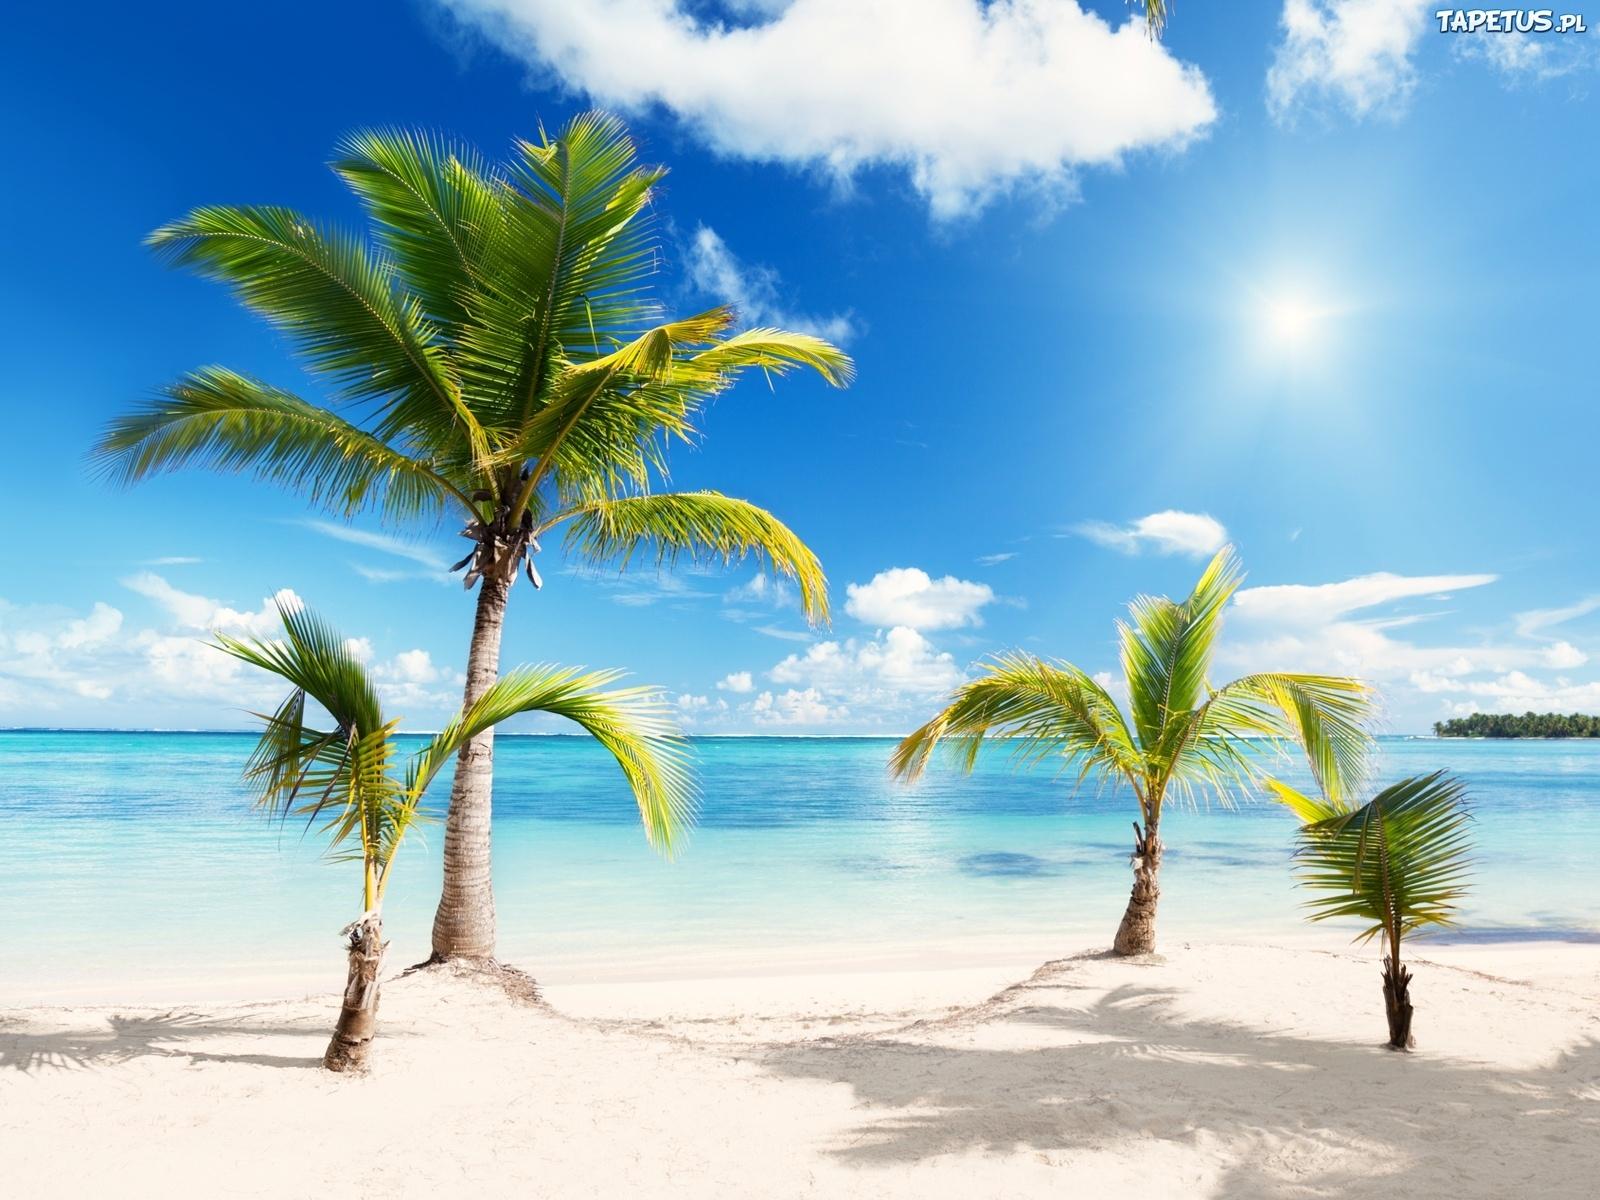 3d Wallpaper Avatar Palmy Plaża Biały Piasek